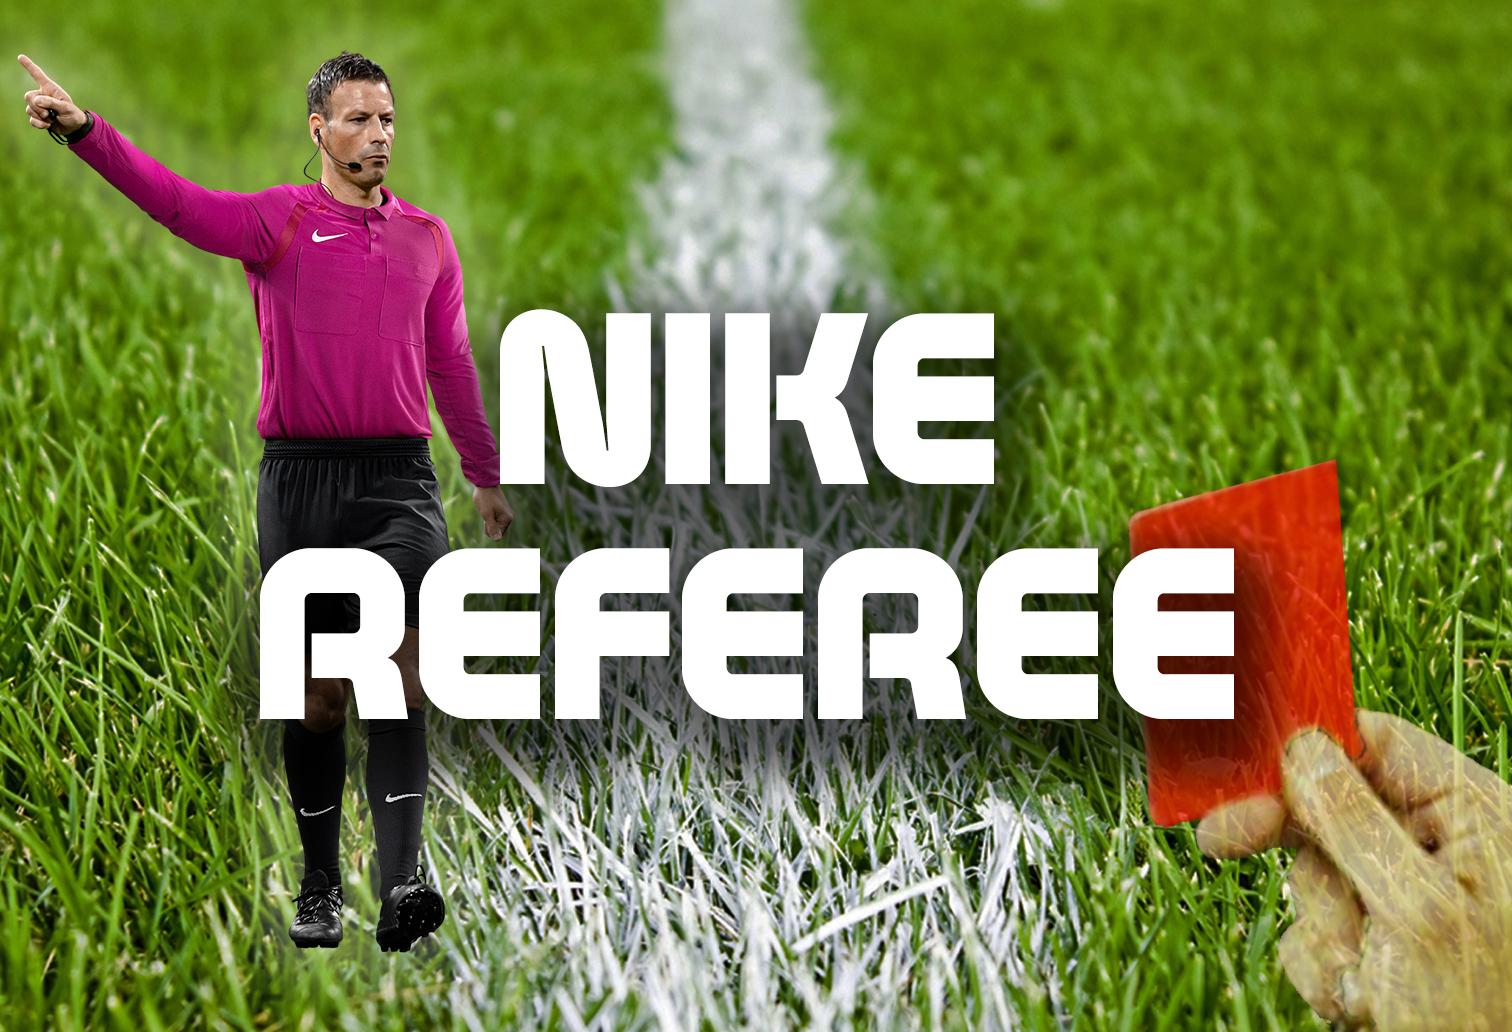 referee-2.jpg